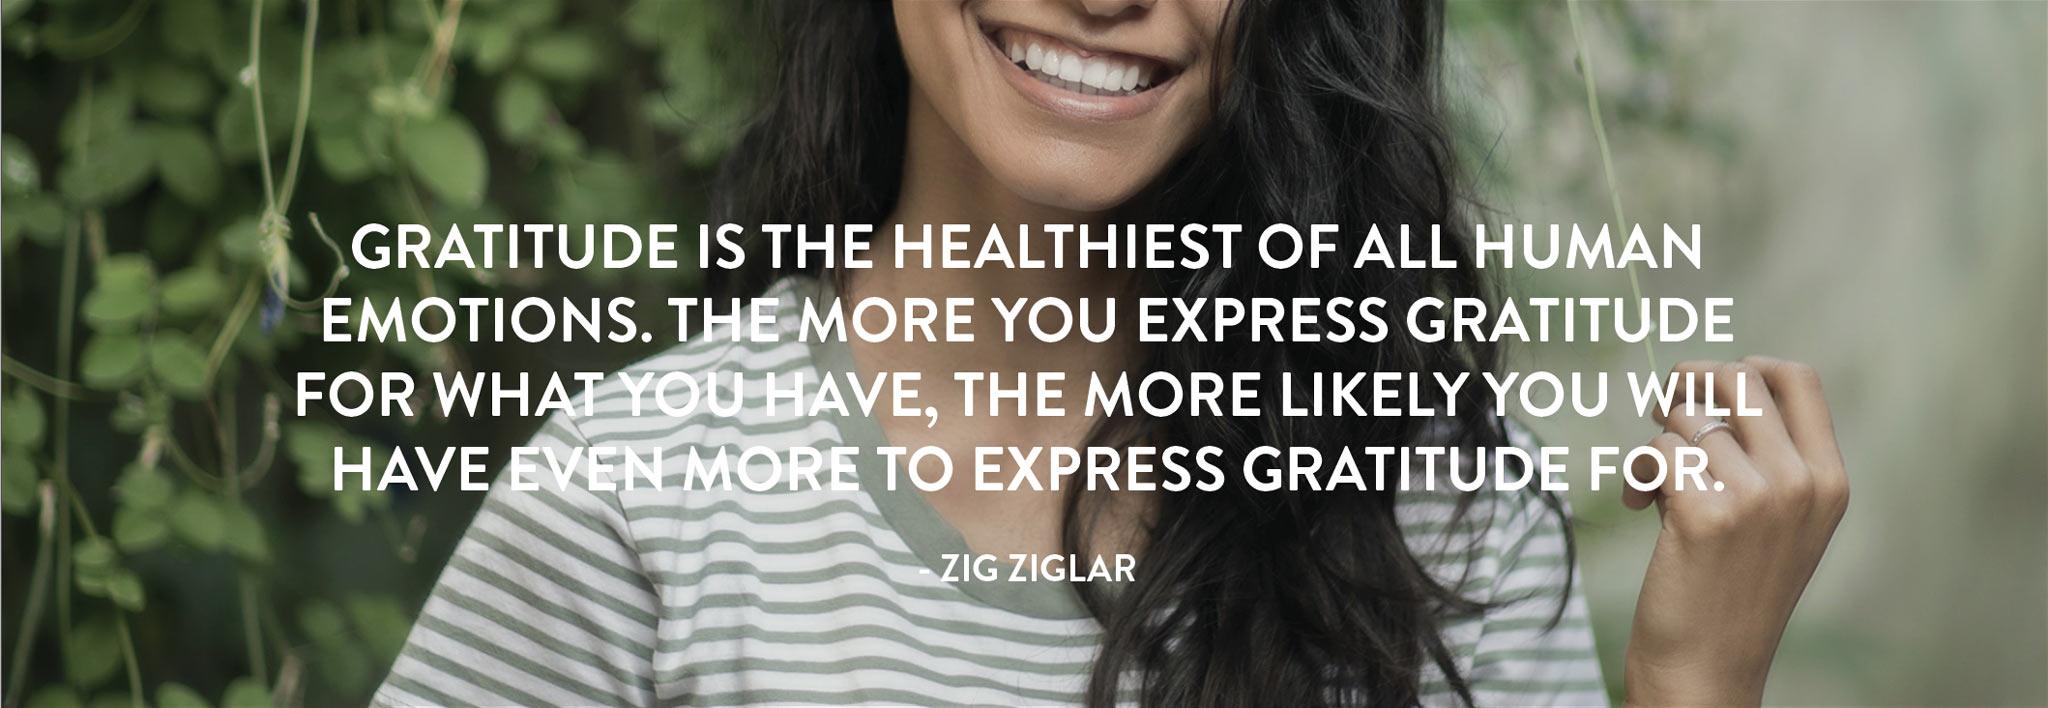 Gratitude-is-quote.jpg